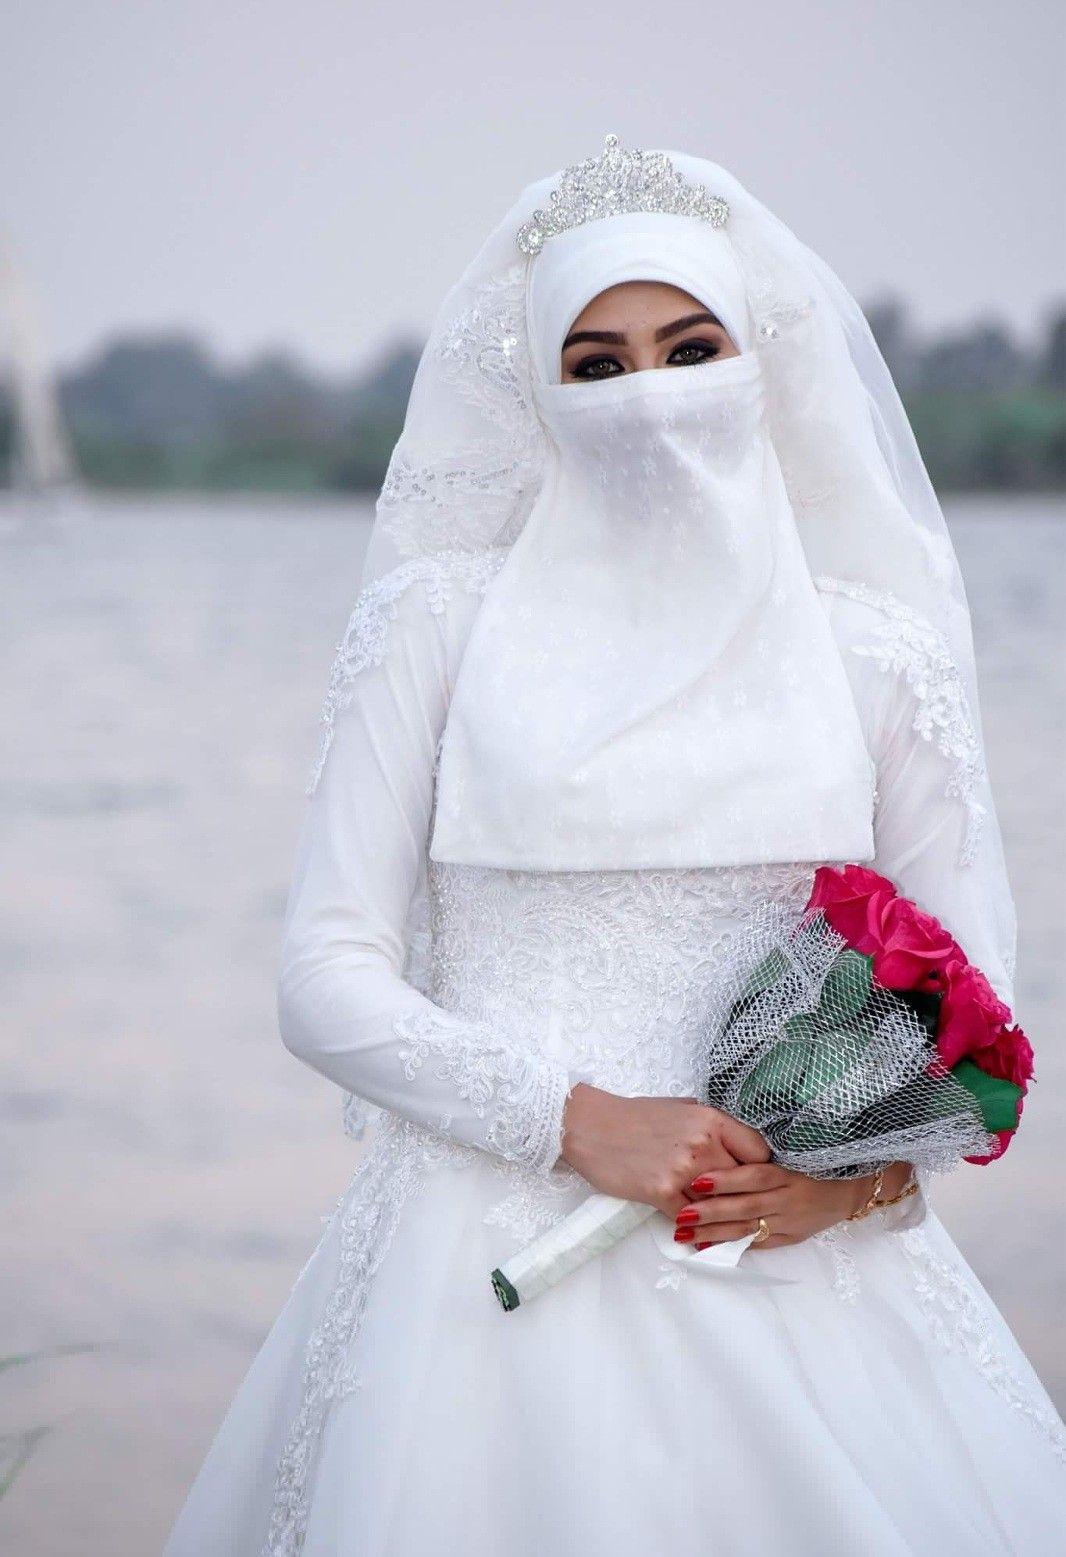 Niqabi bride  Muslim women hijab, Arabic wedding dresses, Hijab